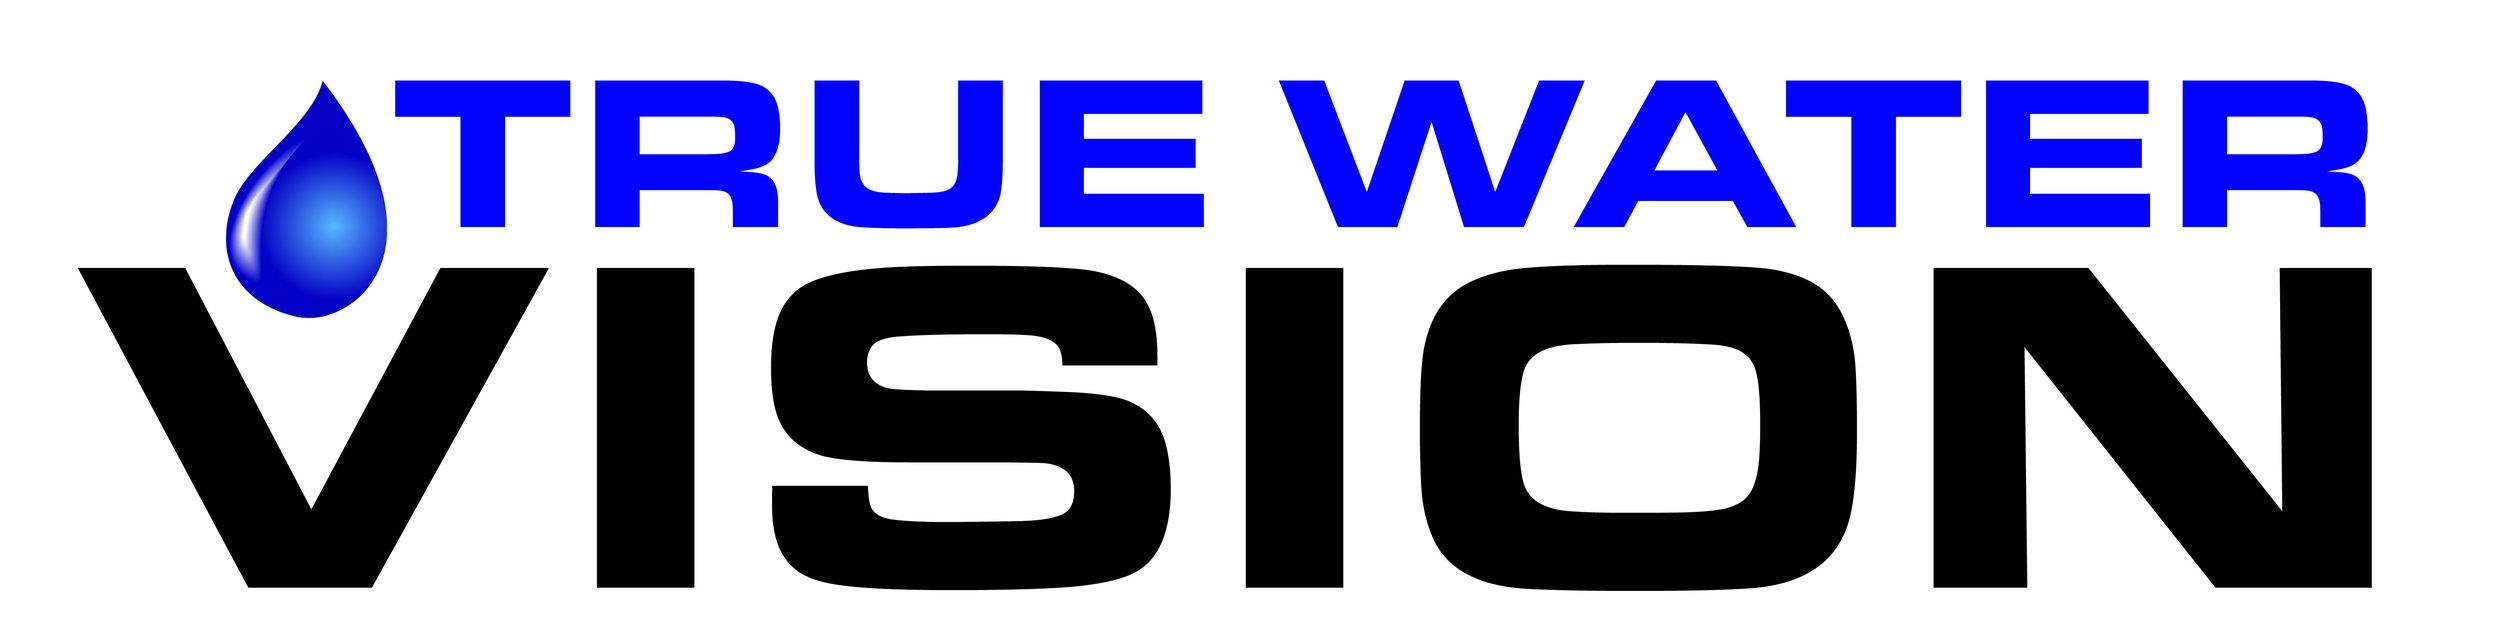 True Water Vision newsletter nameplate.jpg